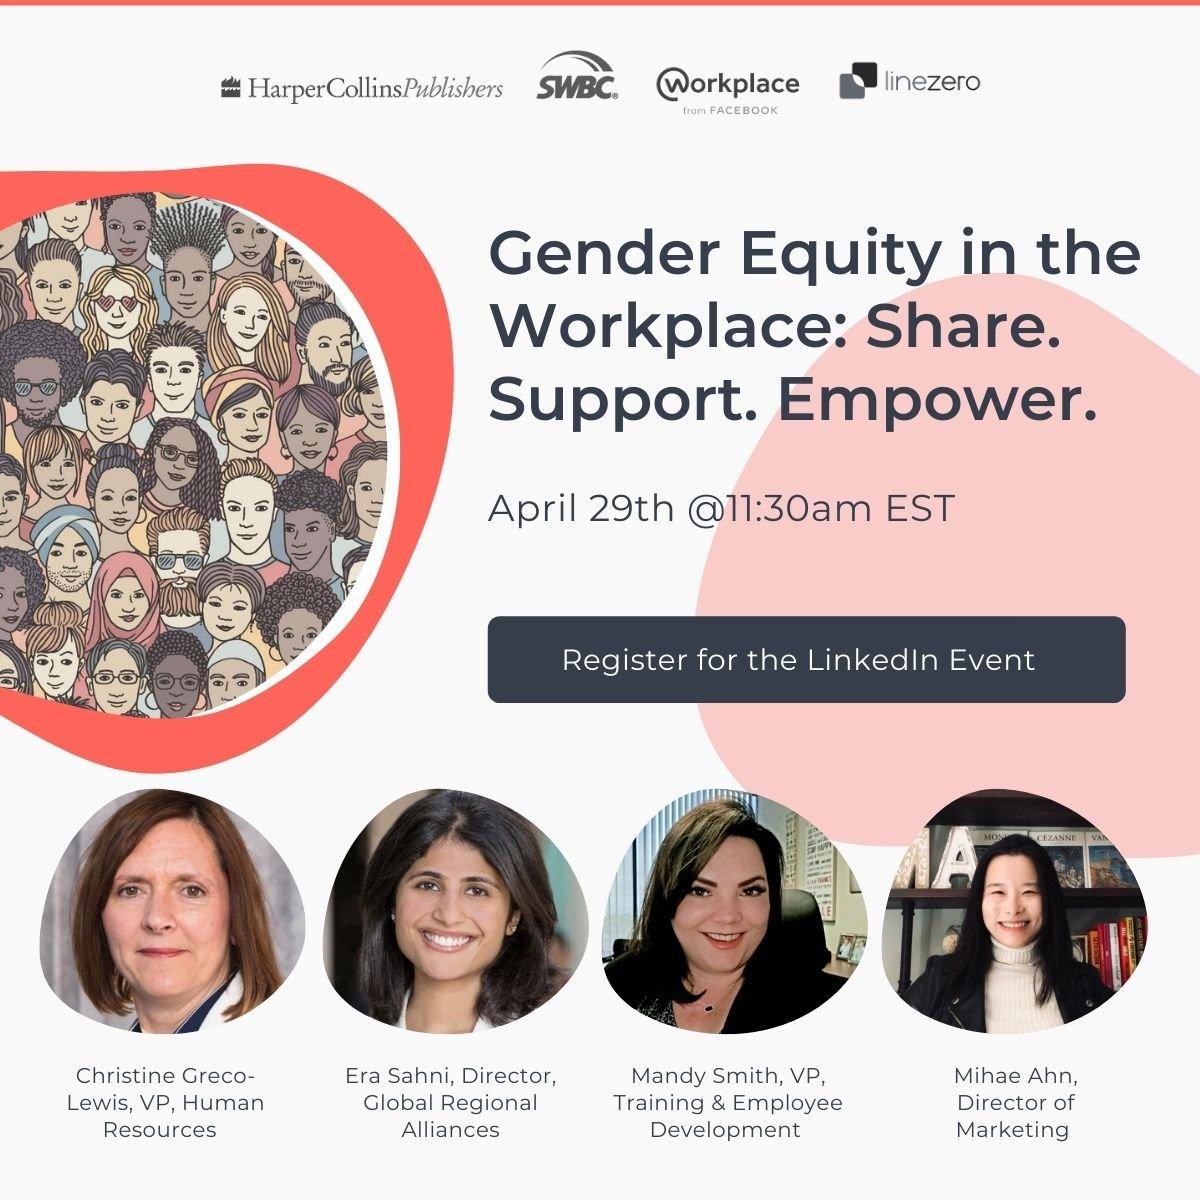 gender equality in workplace webinar